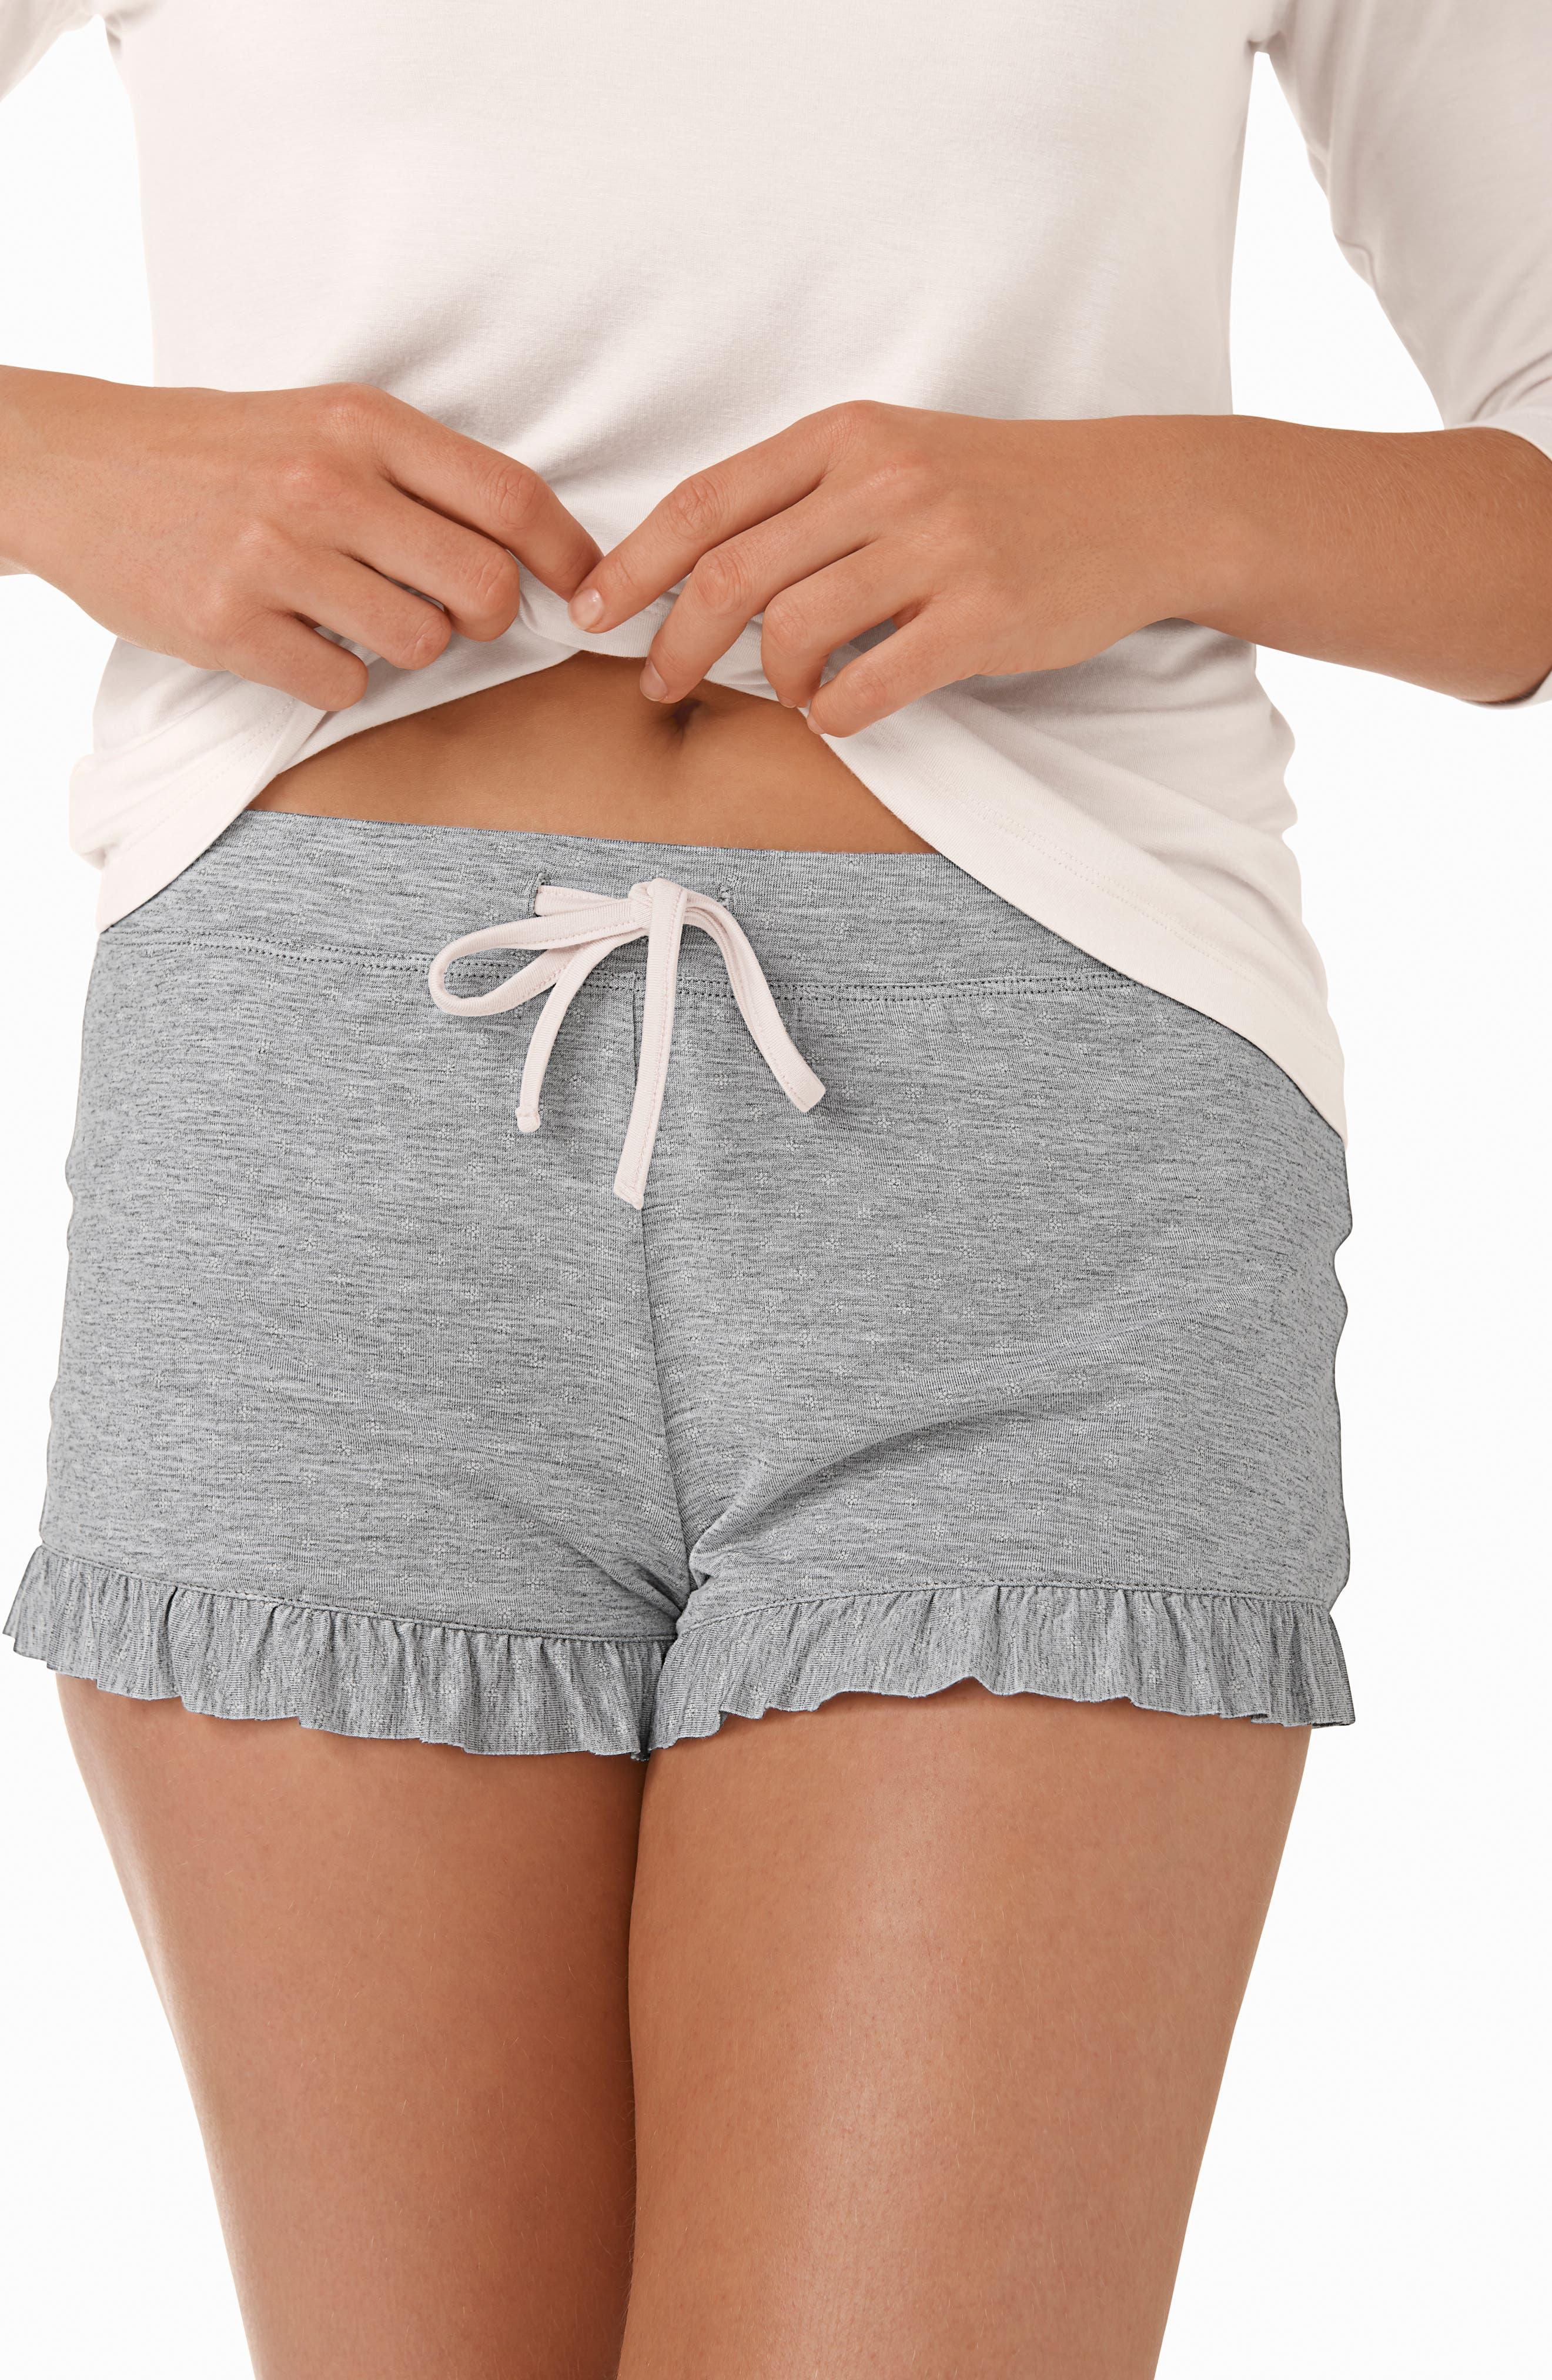 Foulard Star Two Piece Pajamas,                             Alternate thumbnail 4, color,                             PINK/ GREY / WHITE